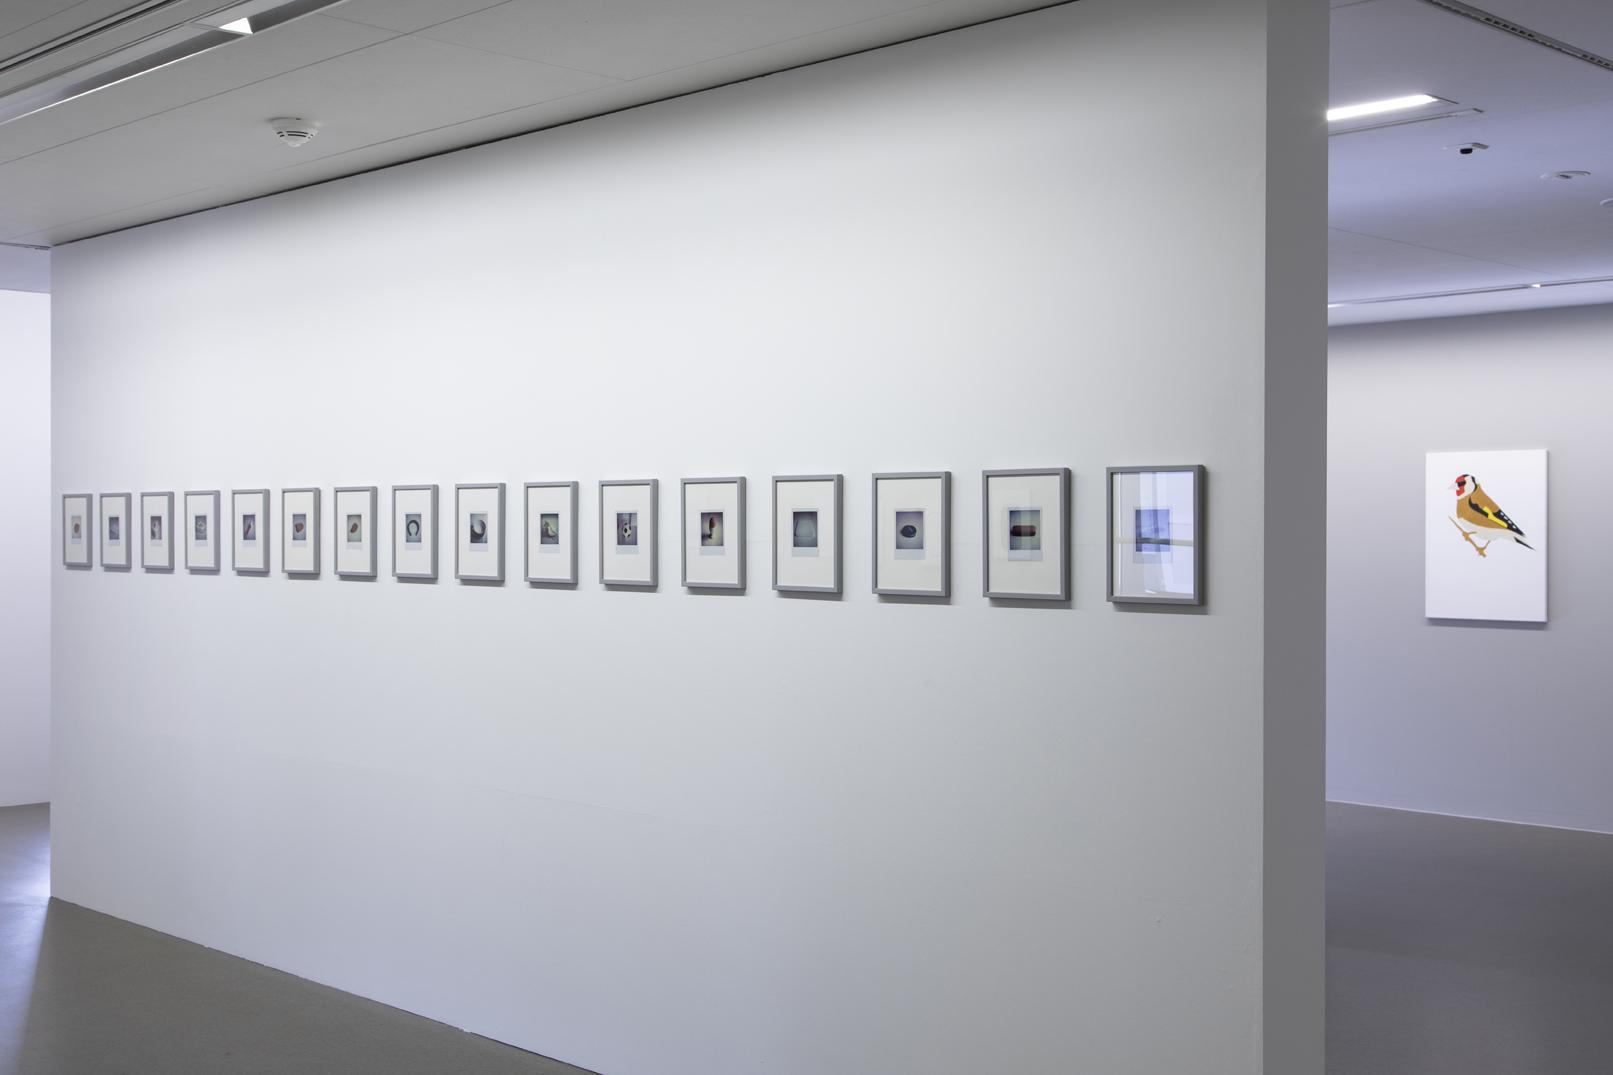 Ulrich-Meister_Polaroids-o.-T._Stieglitz-2017_poesie_fxb_8917